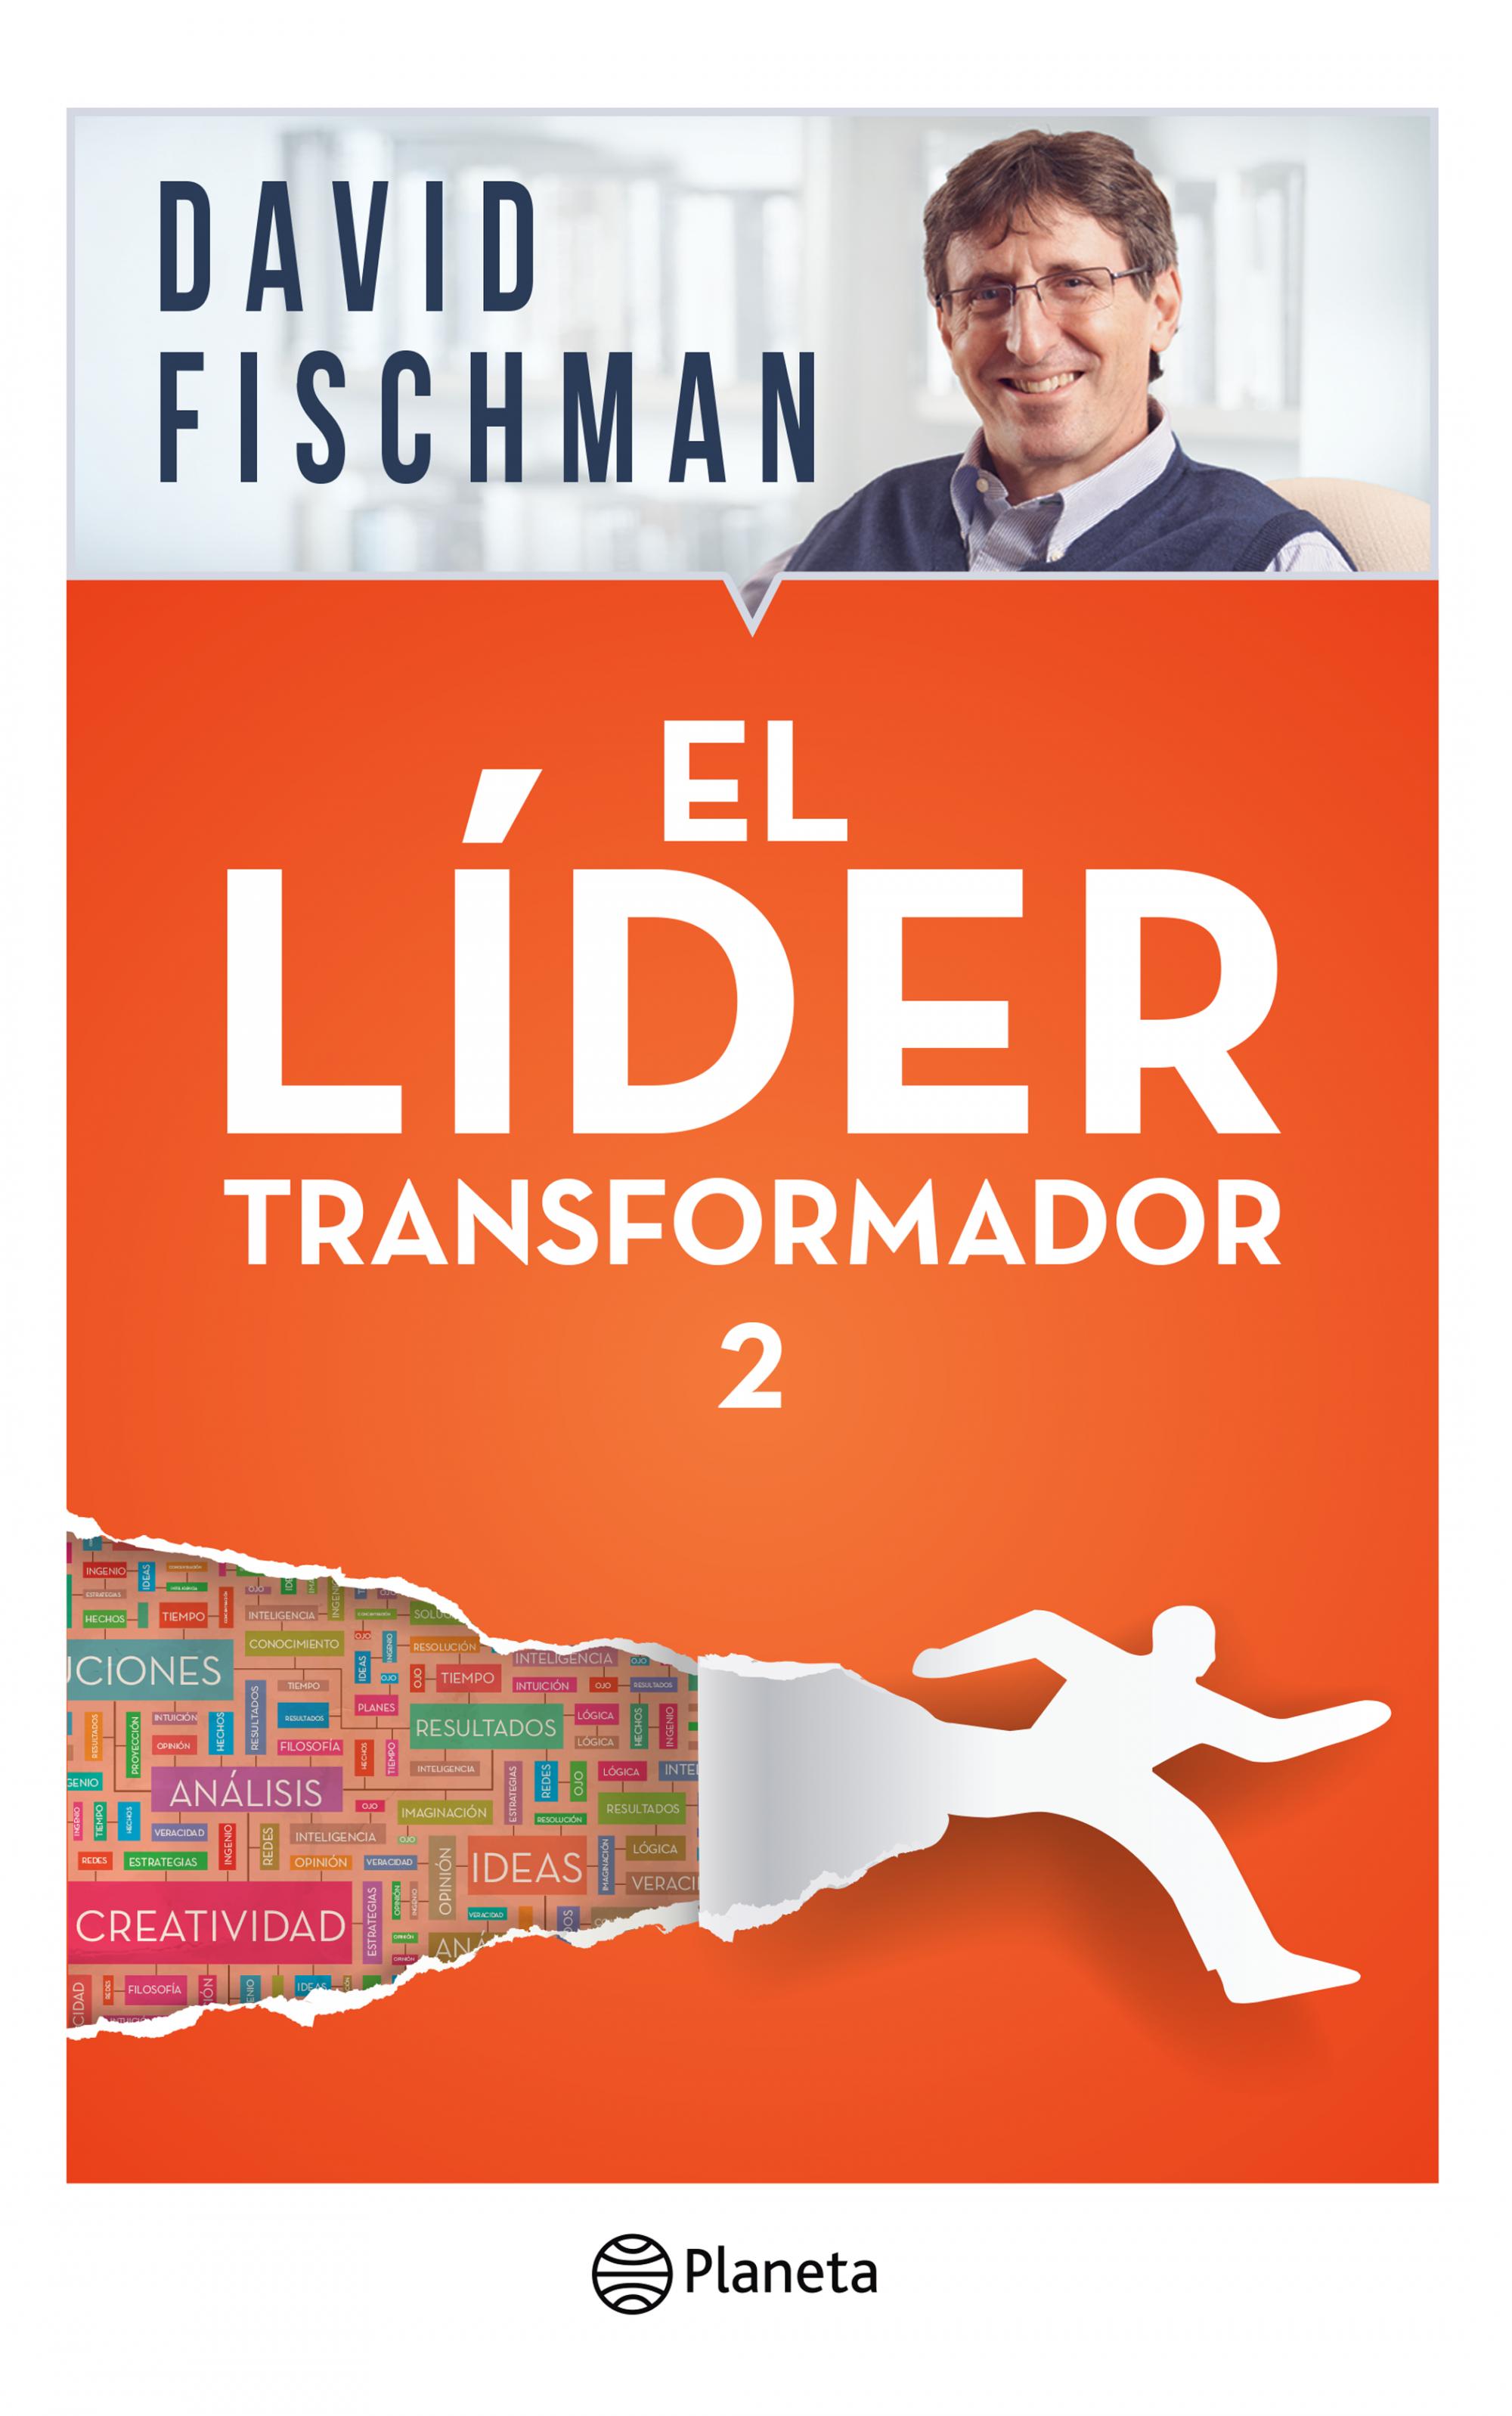 El Lider Transformador 2 - David Fischman - Planeta